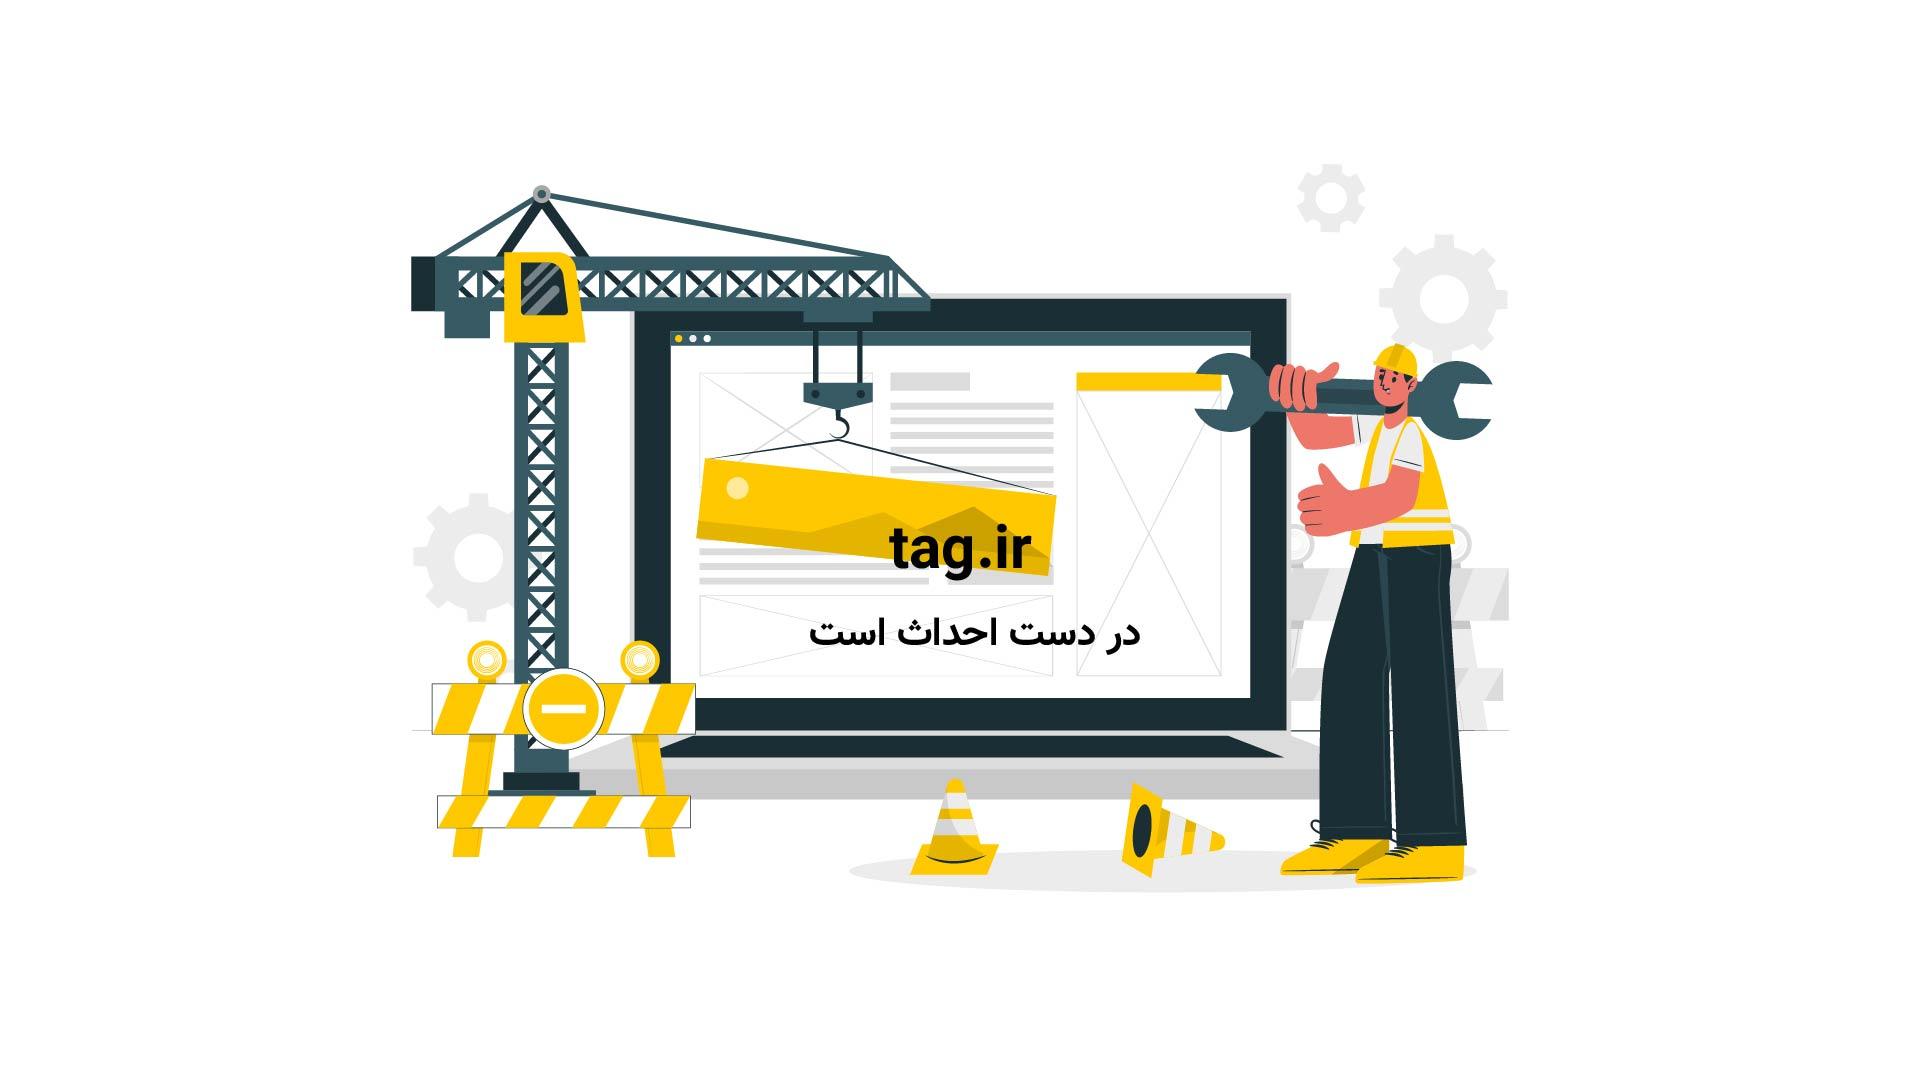 کمپانی راکوتن، اسپانسر رسمی بارسلونا تا 2021 شد | فیلم